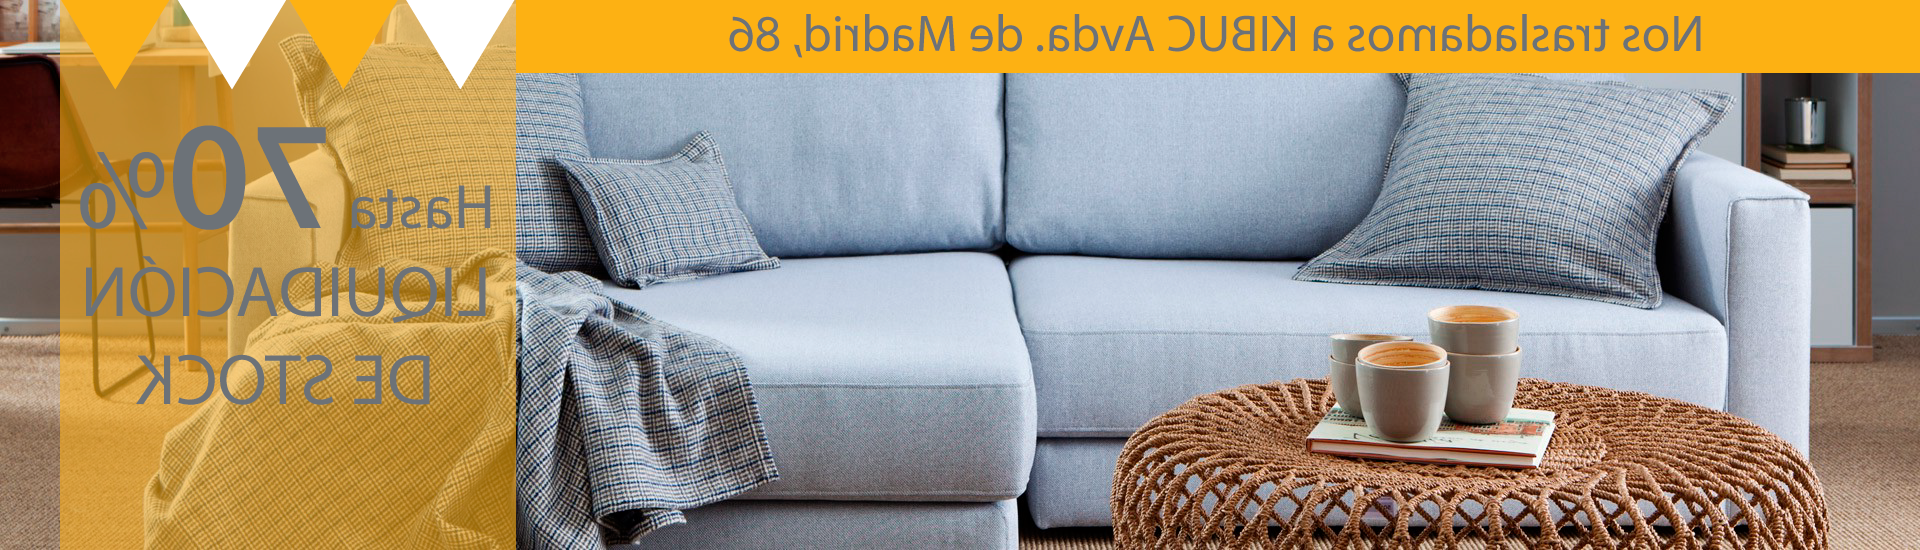 Kibuc sofas Cama Ftd8 Muebles Barajas Home